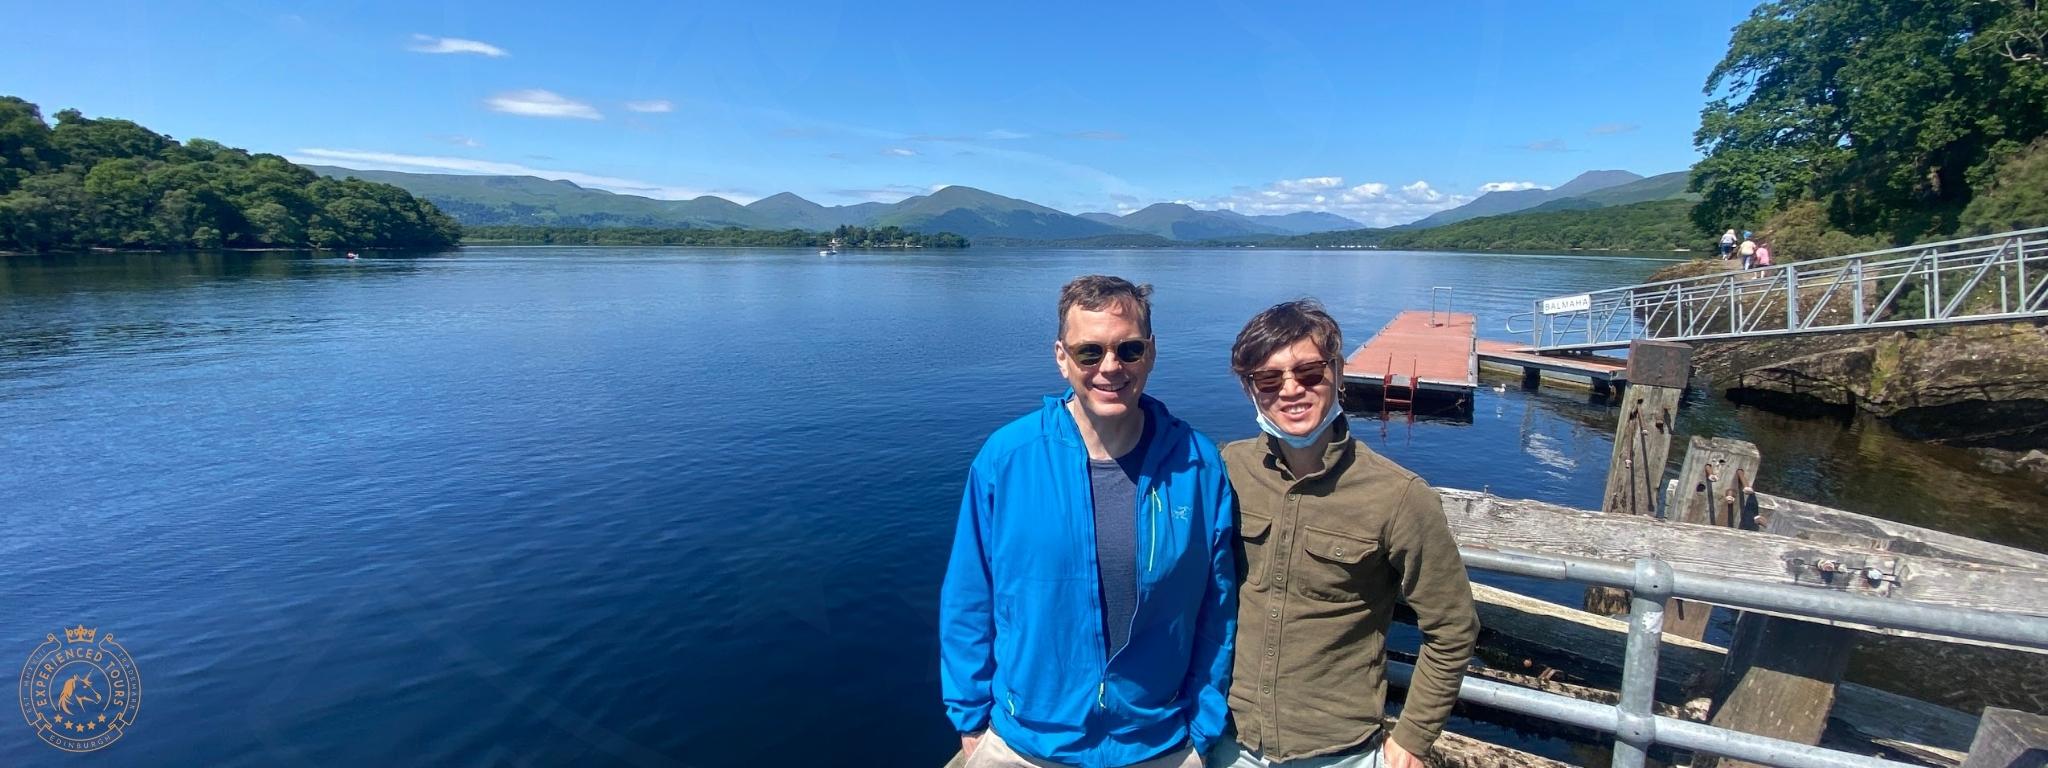 Clients at Loch Lomond